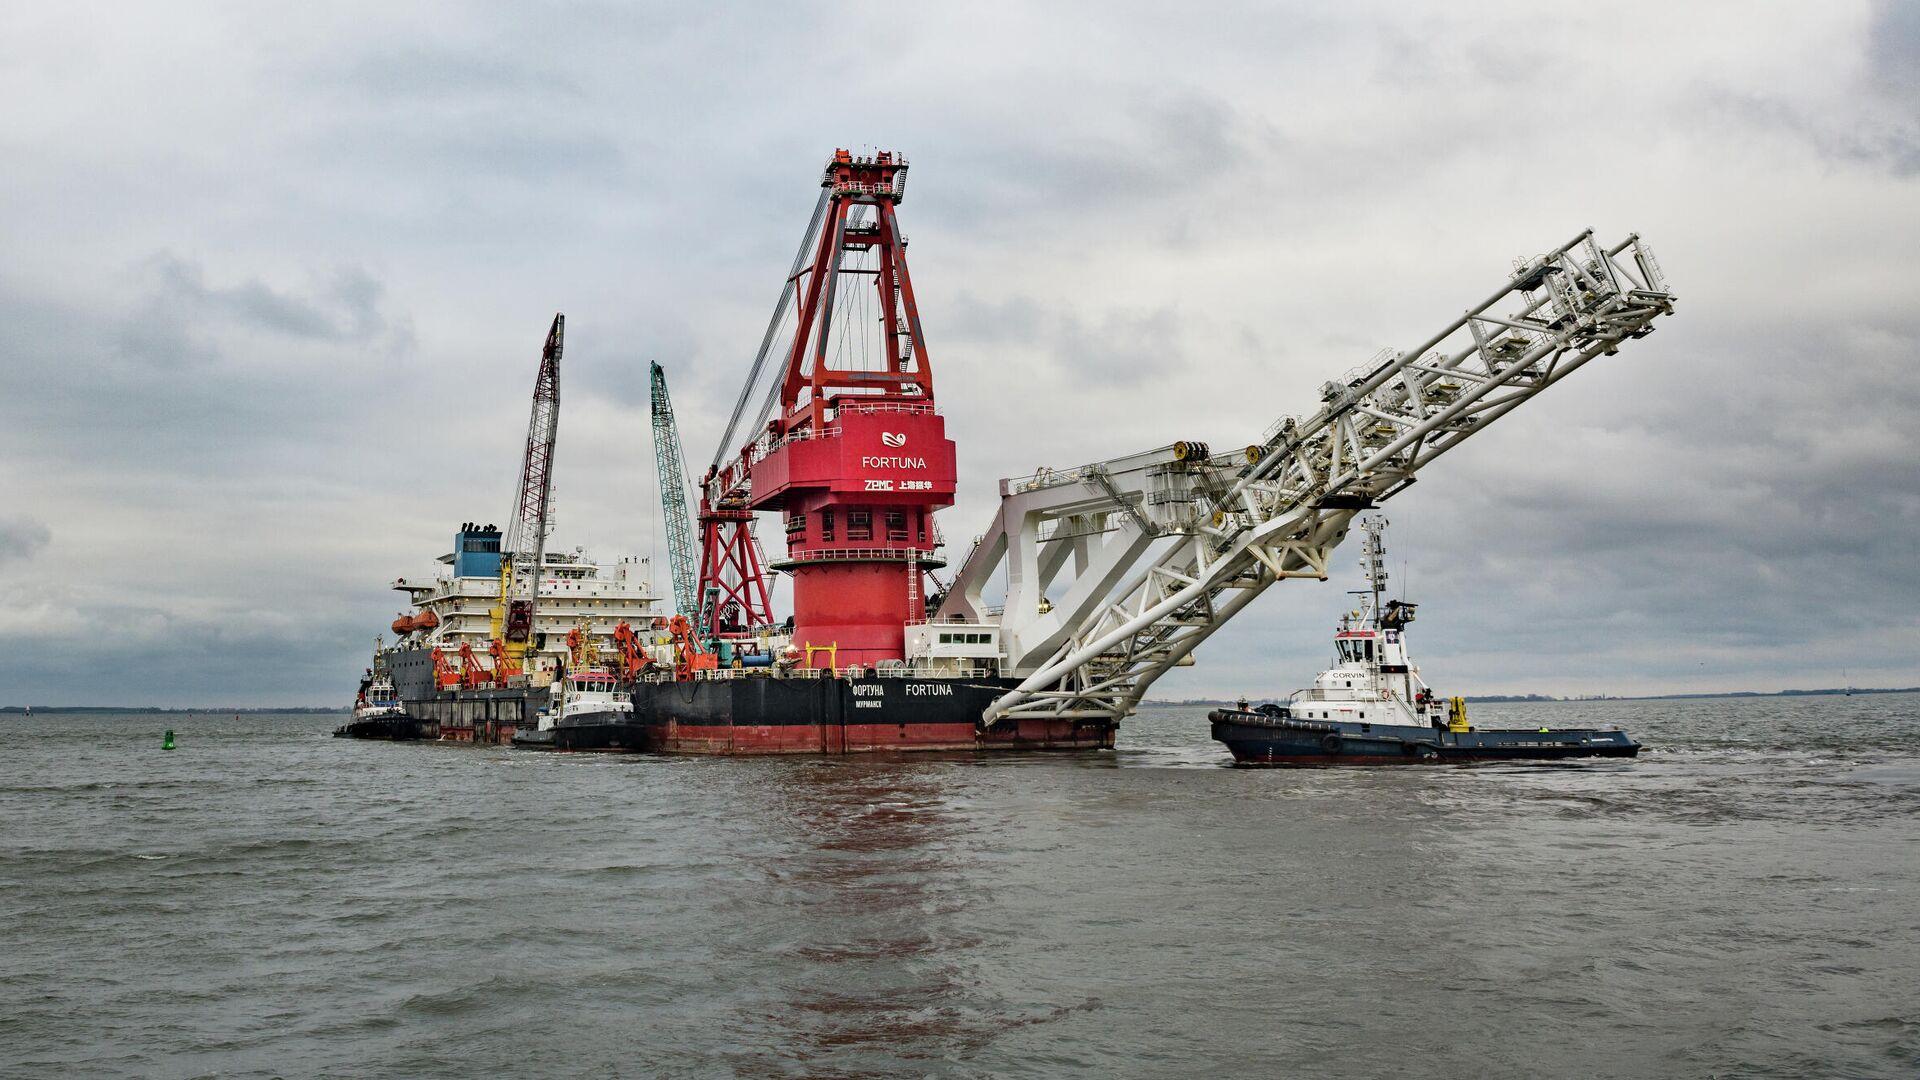 Судно-трубоукладчик Фортуна покидает порт Висмар - РИА Новости, 1920, 23.05.2021